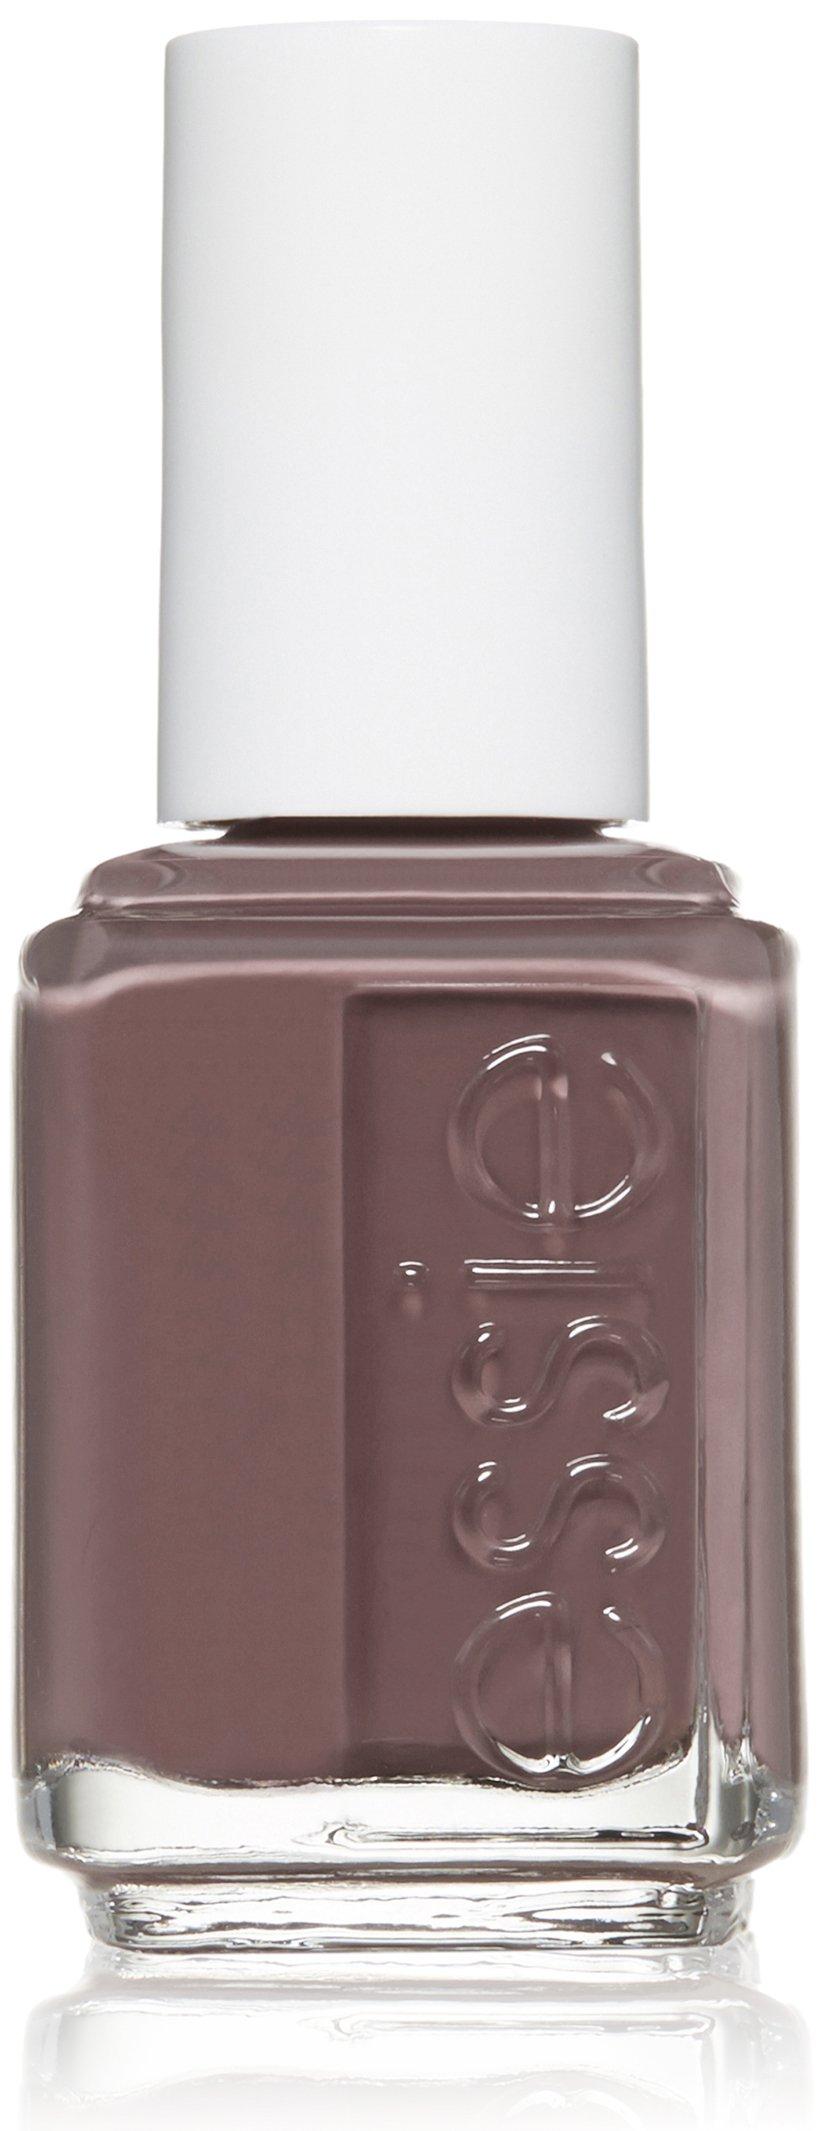 Amazon.com : essie nail polish, smokin\' hot, gray nail polish, 0.46 ...